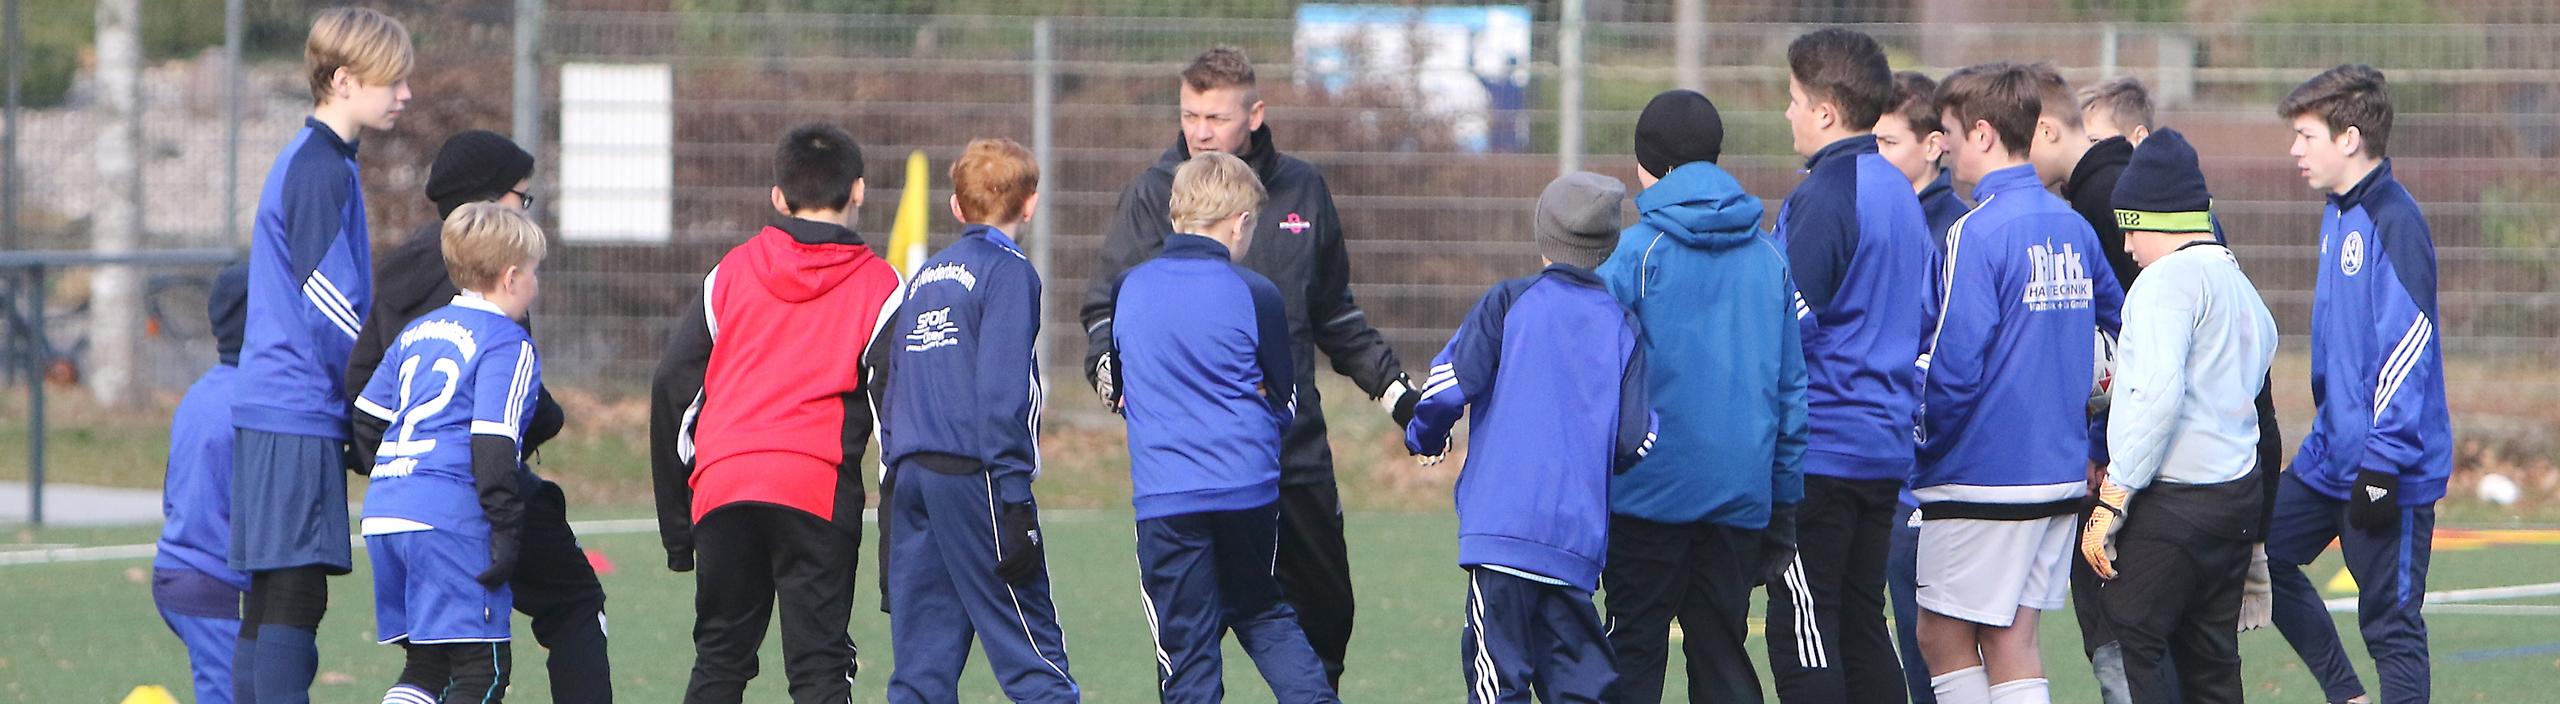 Der ewige Konflikt im Kinderfußball: Eltern vs. Trainer